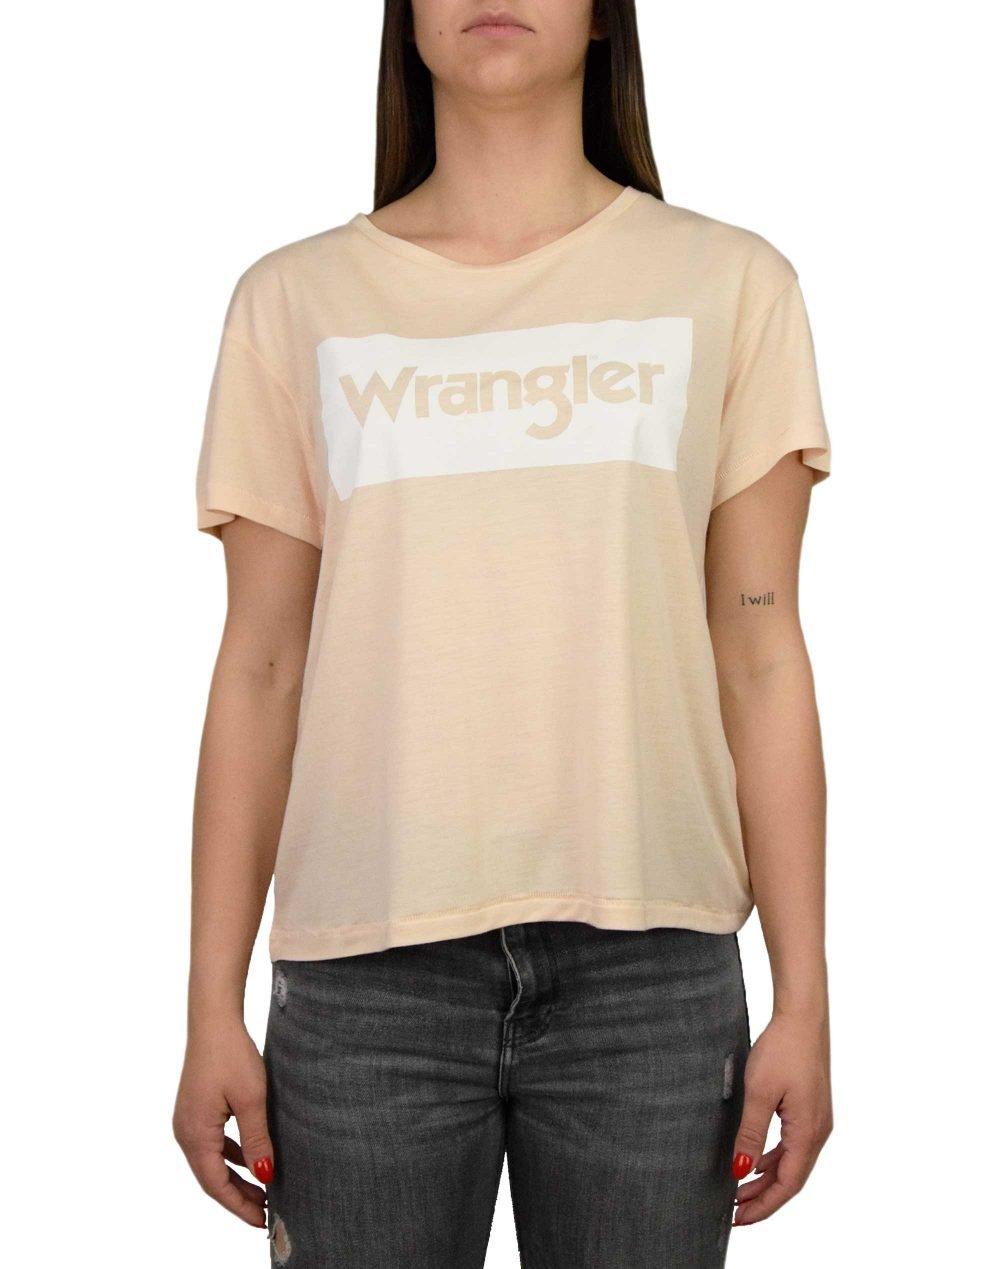 Wrangler Drape Tee (W7016DIX7) Tender Peach